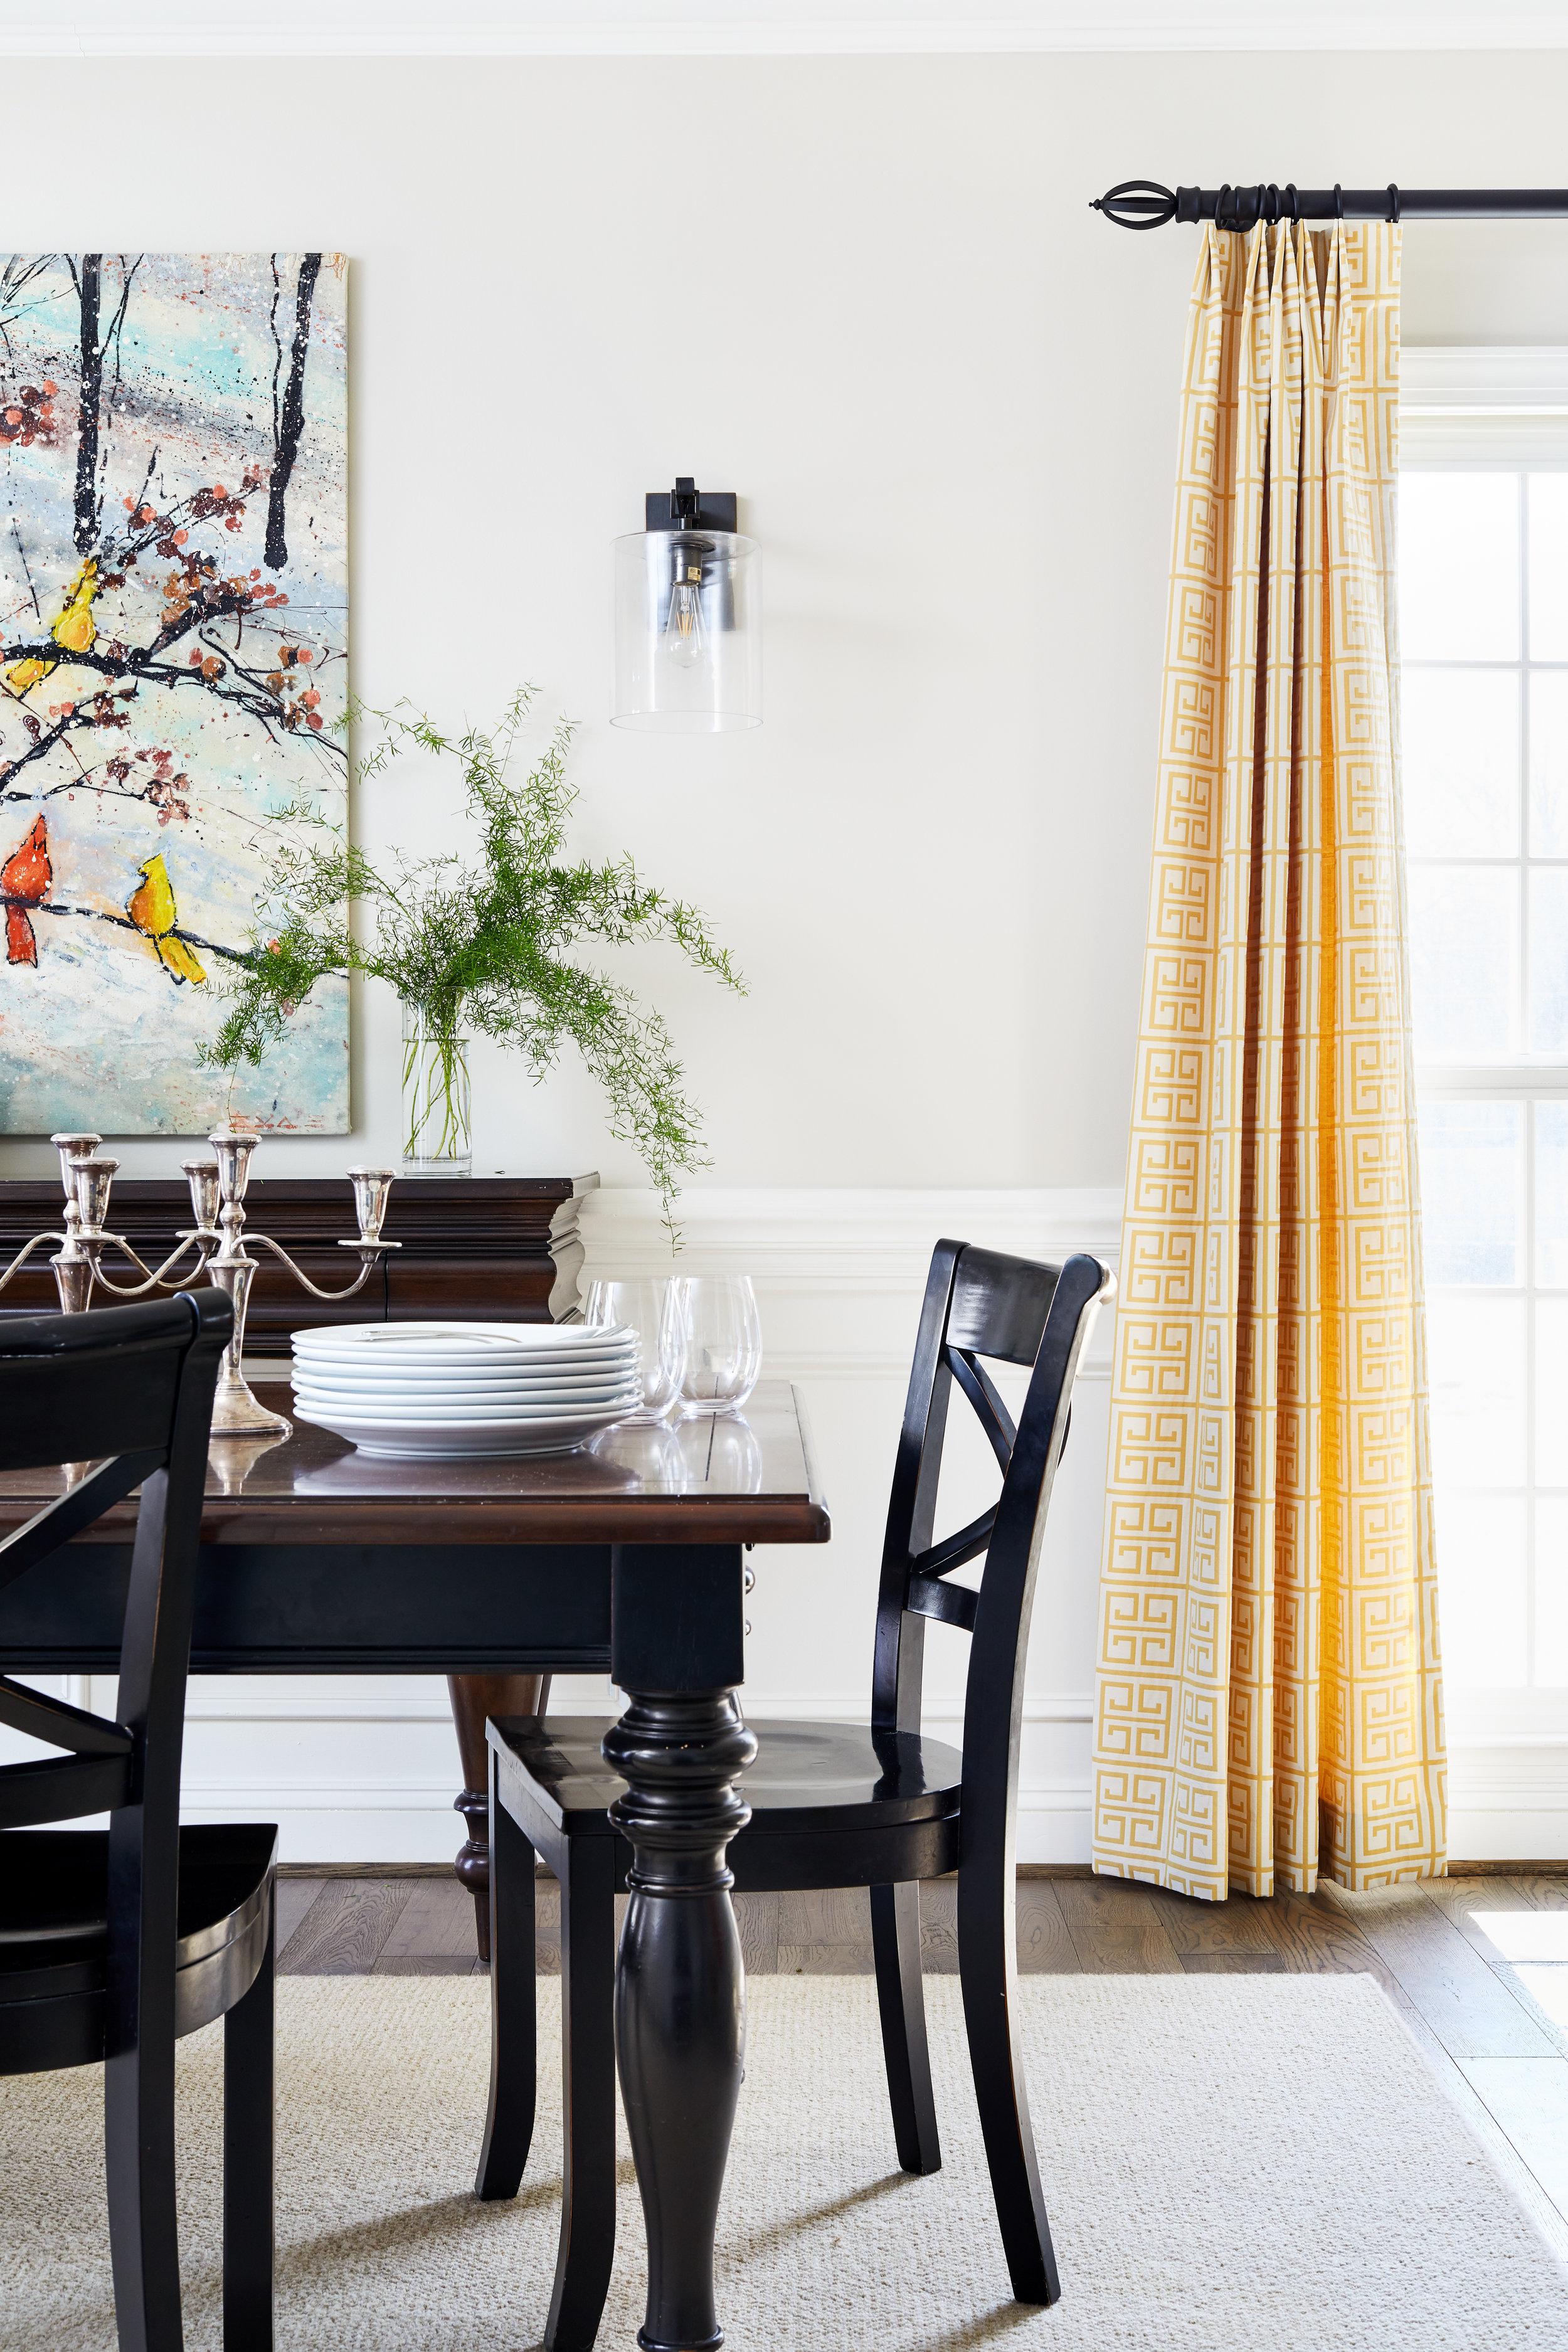 Photo: Stacy Zarin Goldberg  As seen on  Home & Design Magazine